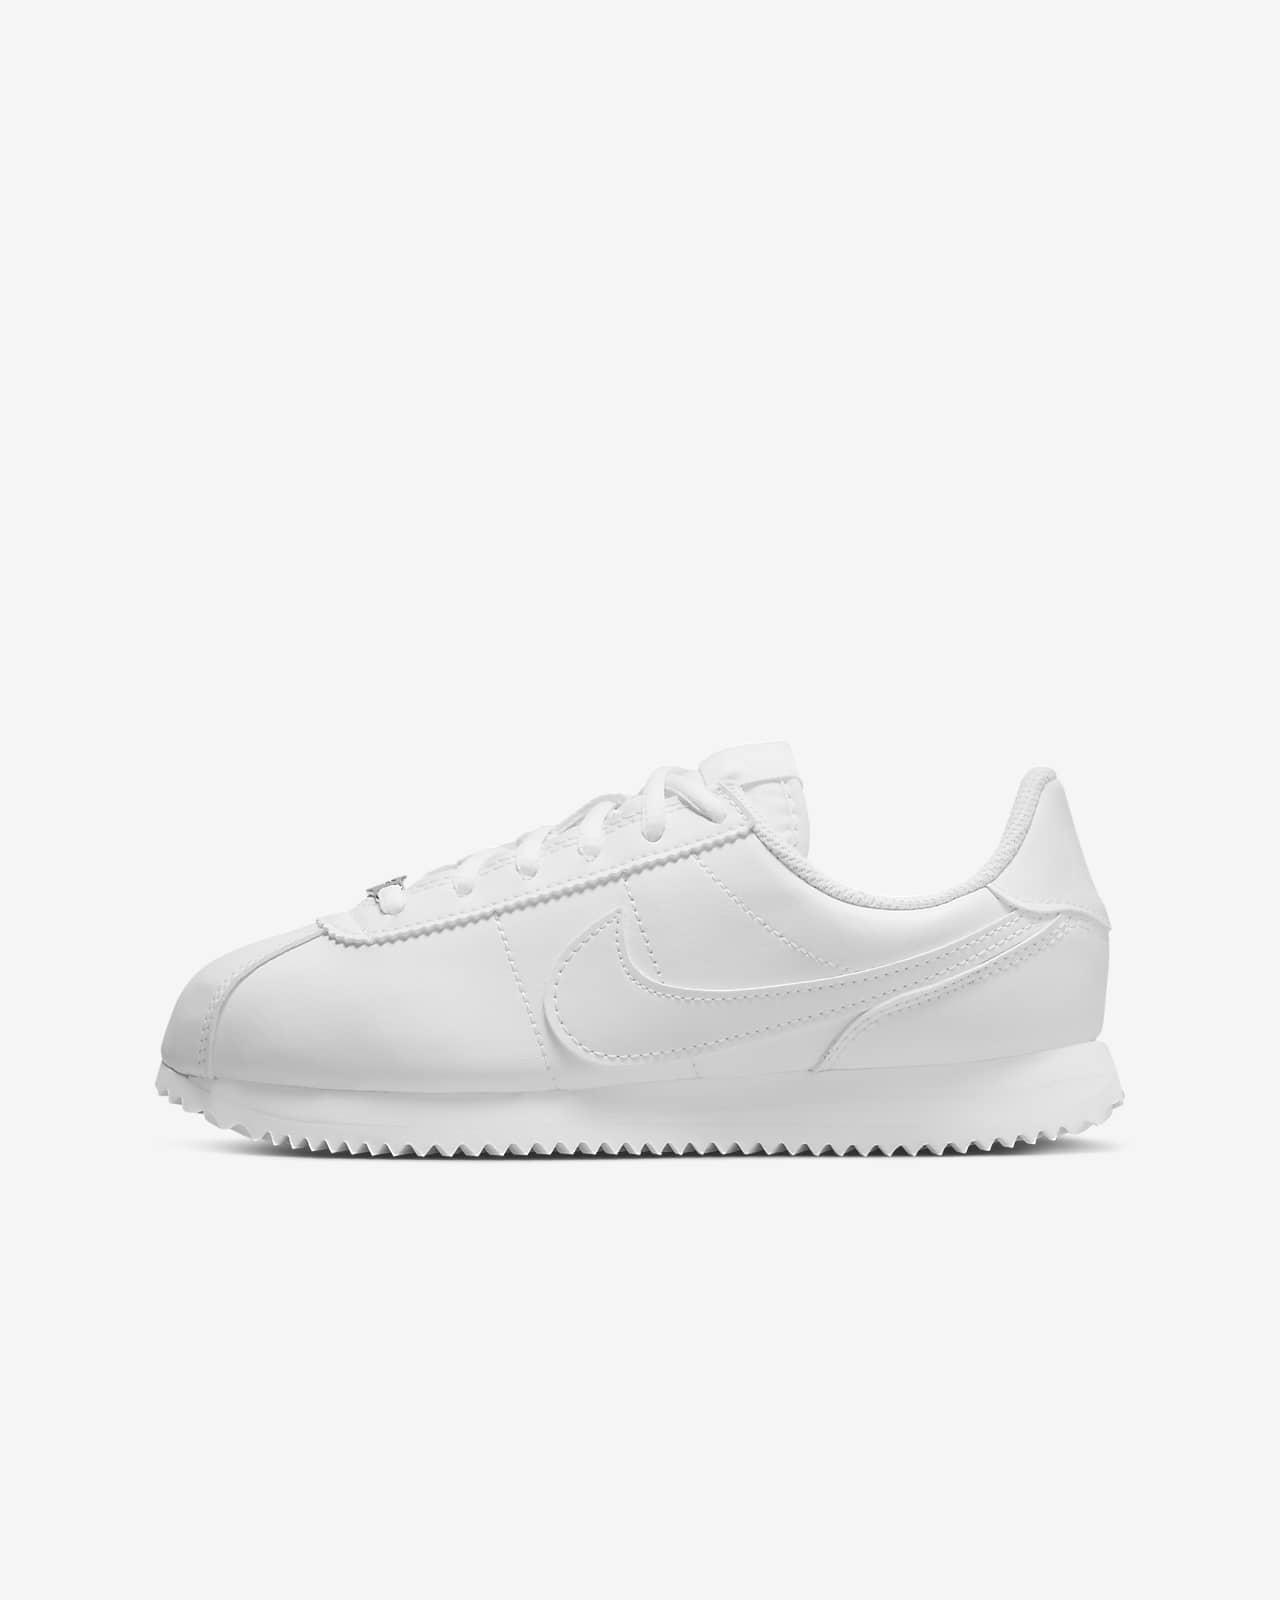 Nike Cortez Basic 大童 (男童) 鞋款